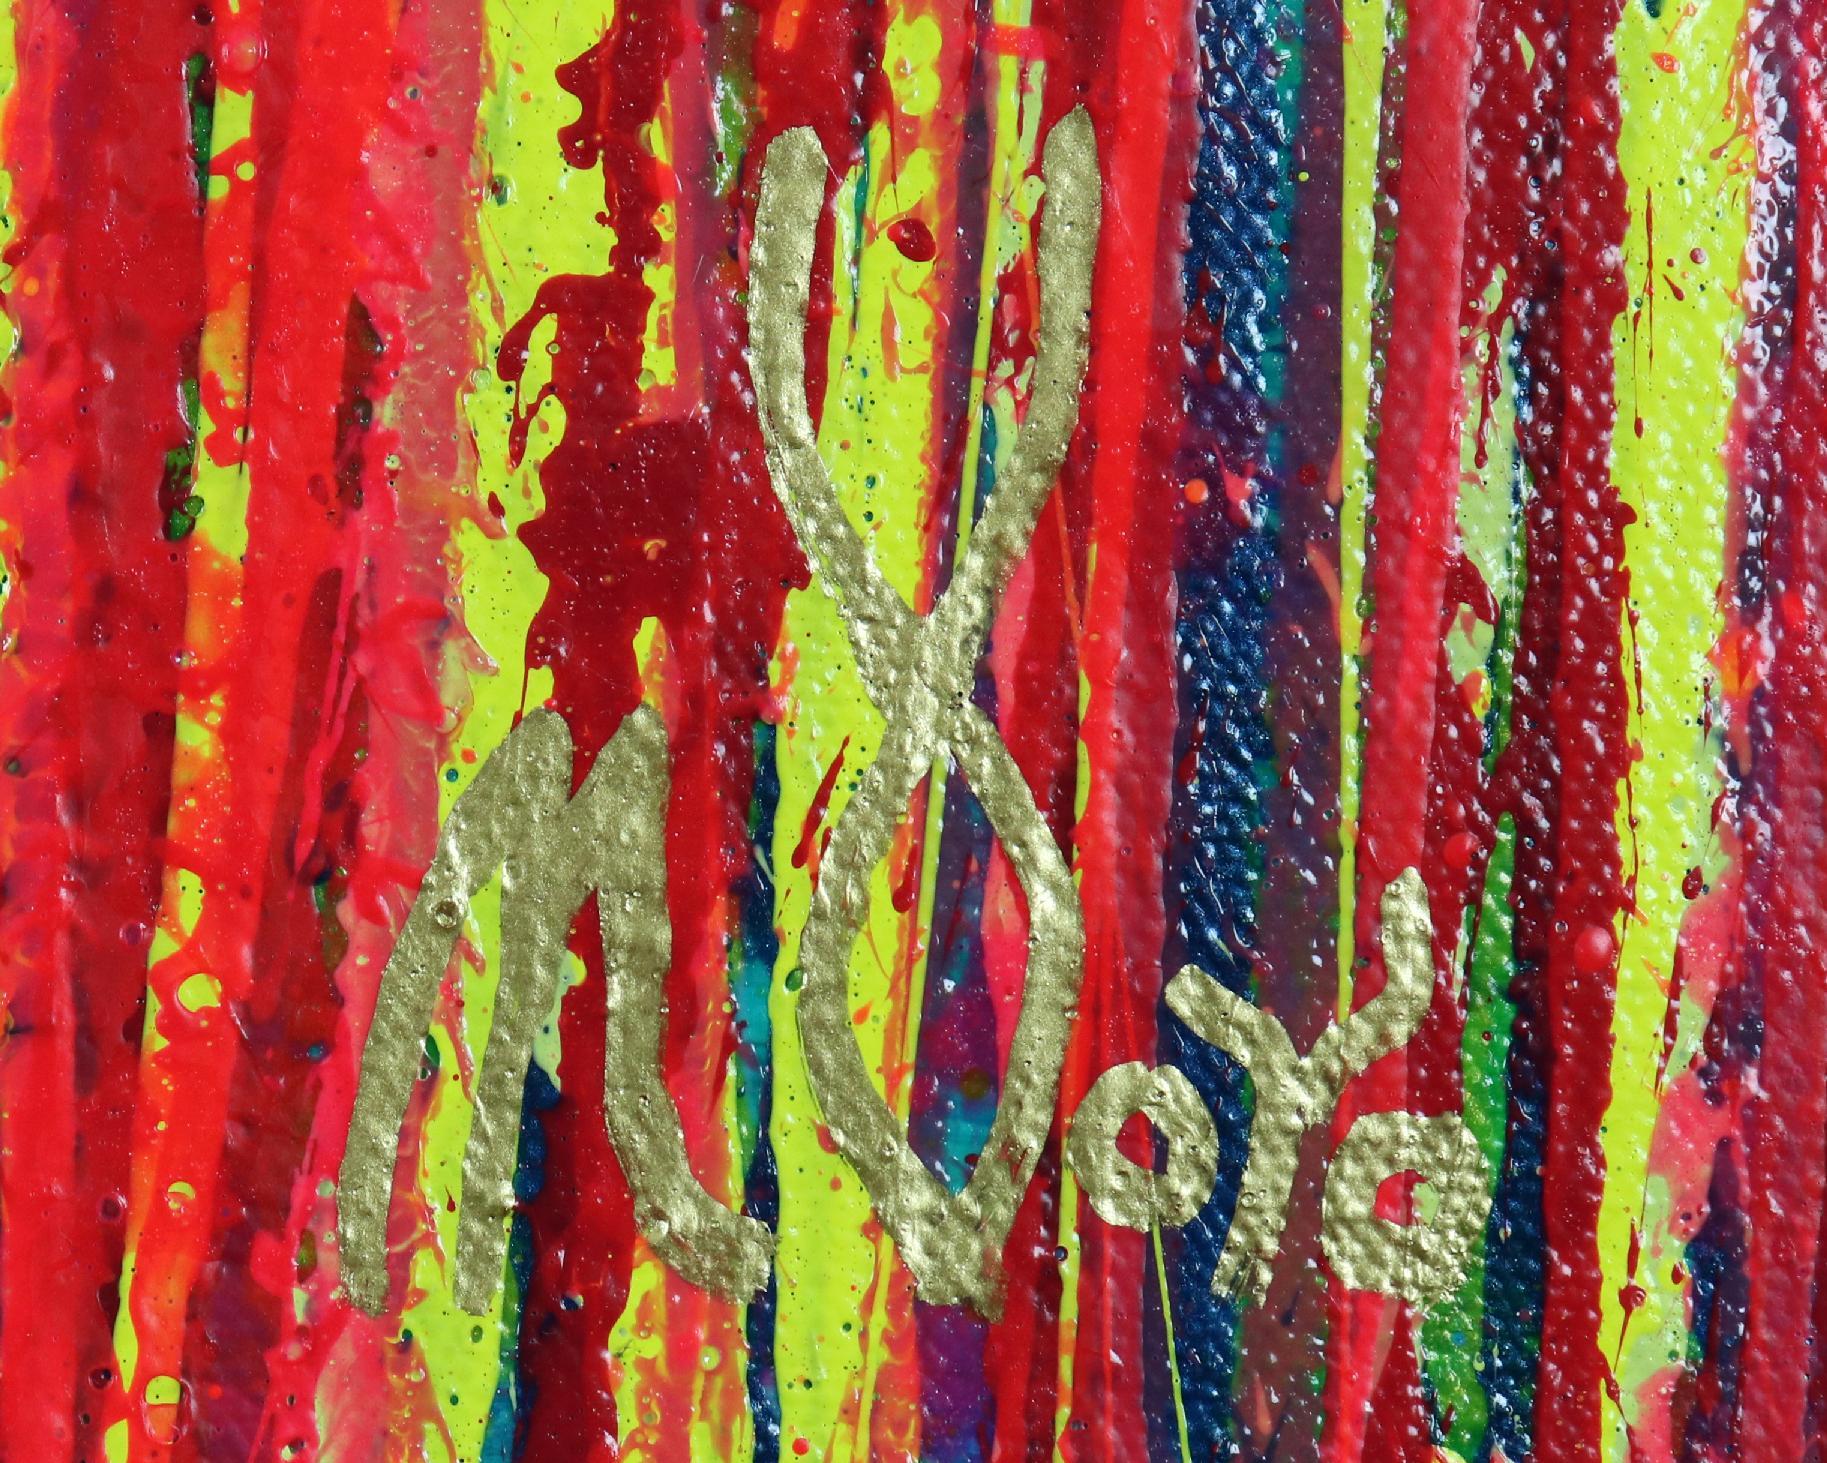 Signature - Prophesy Garden (2020) by Nestor Toro / SOLD